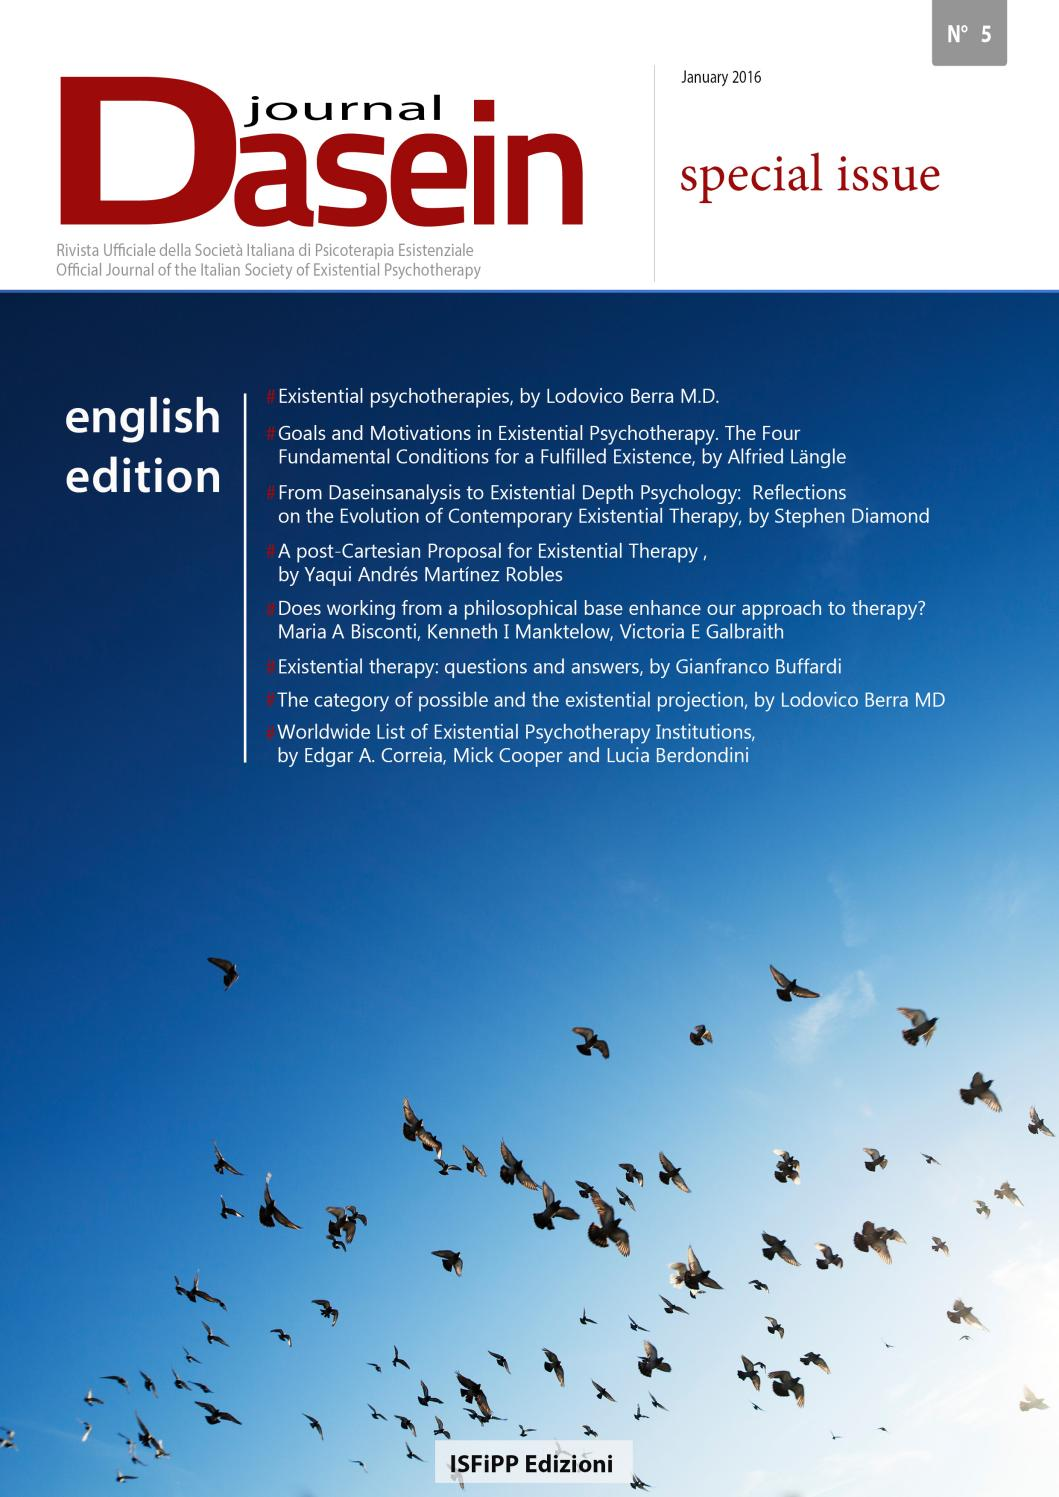 Dasein Journal N°5 by ISFiPP Filosofia Psicologia Psichiatria - issuu